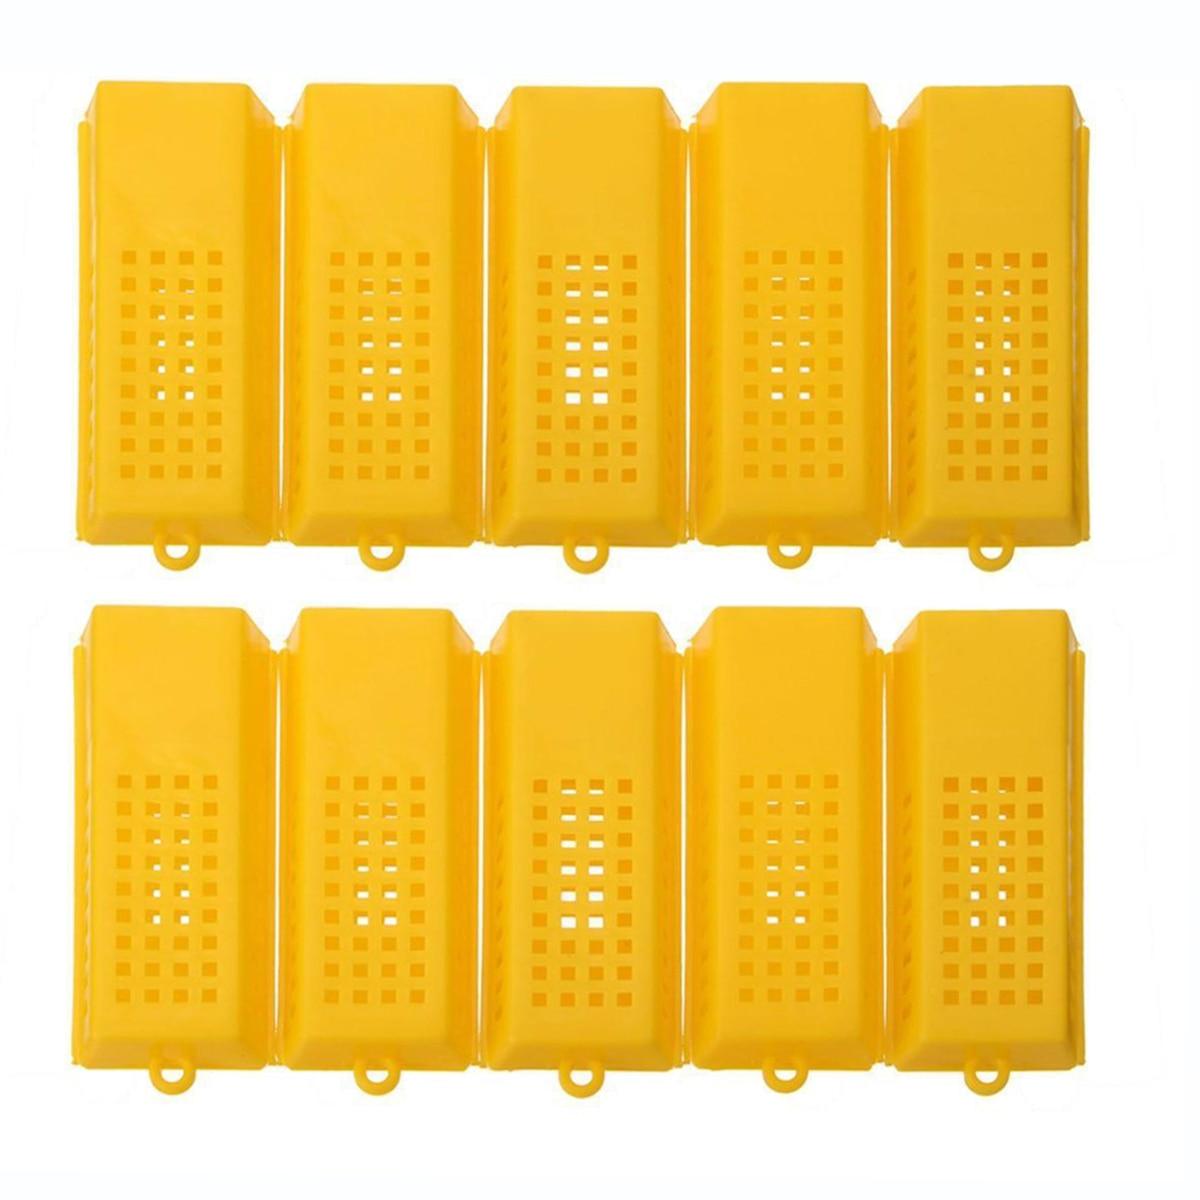 Ingenious 10pcs/lot New Professional Queen Bee Butler Cage Catcher Trap Case Beekeeping Tool Home & Garden